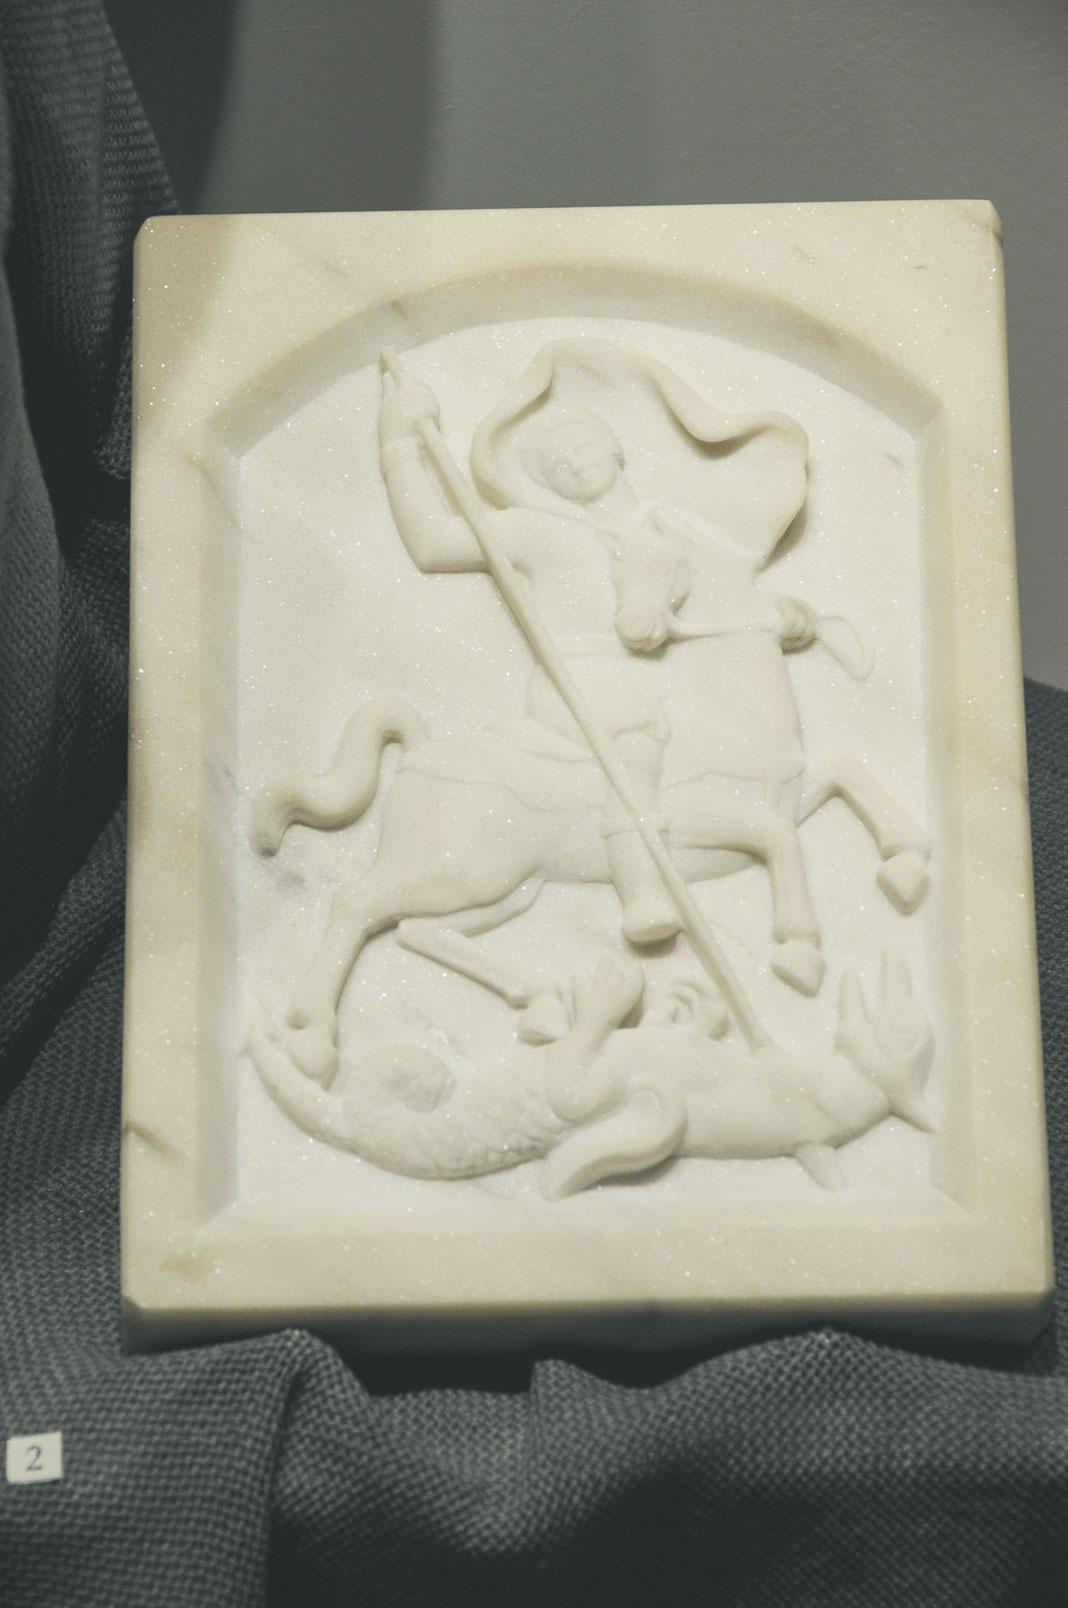 troyan-museum-jivotat-na-edna-idea-11